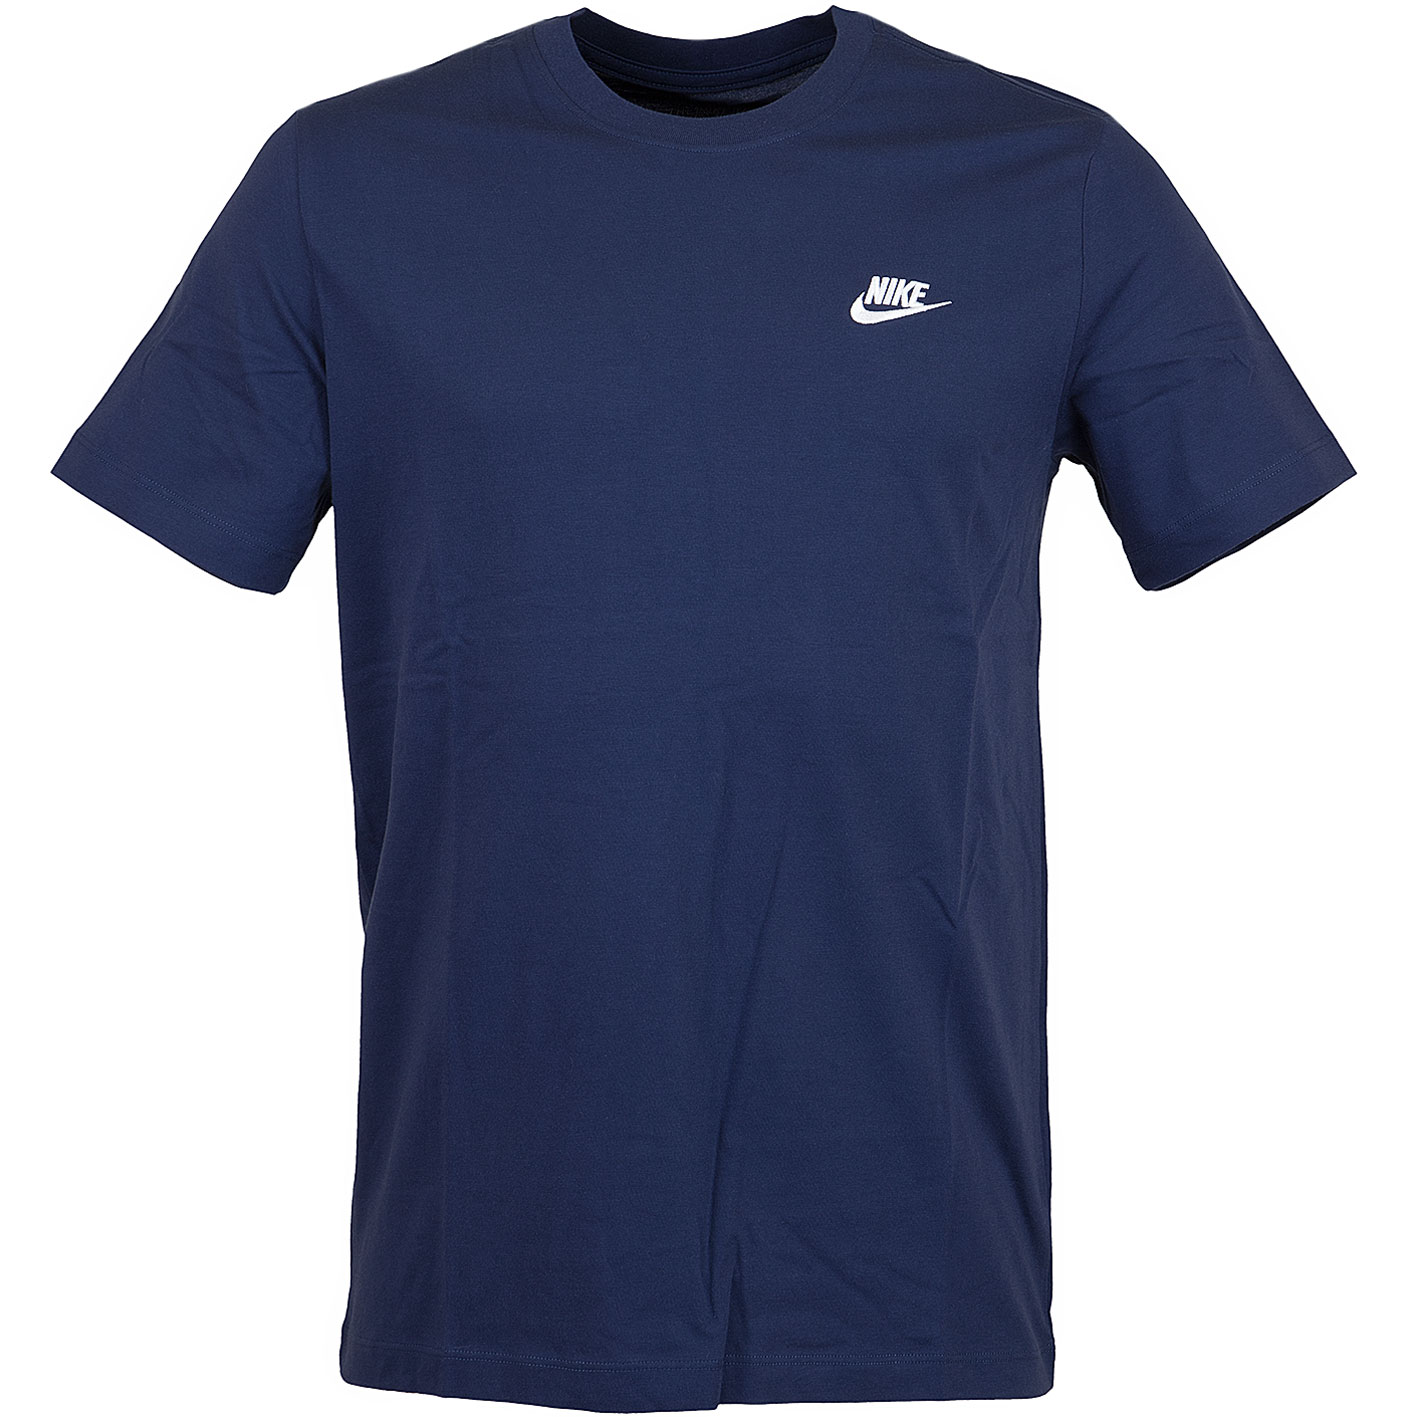 nike t-shirt club dunkelblau/weiß - hier bestellen!